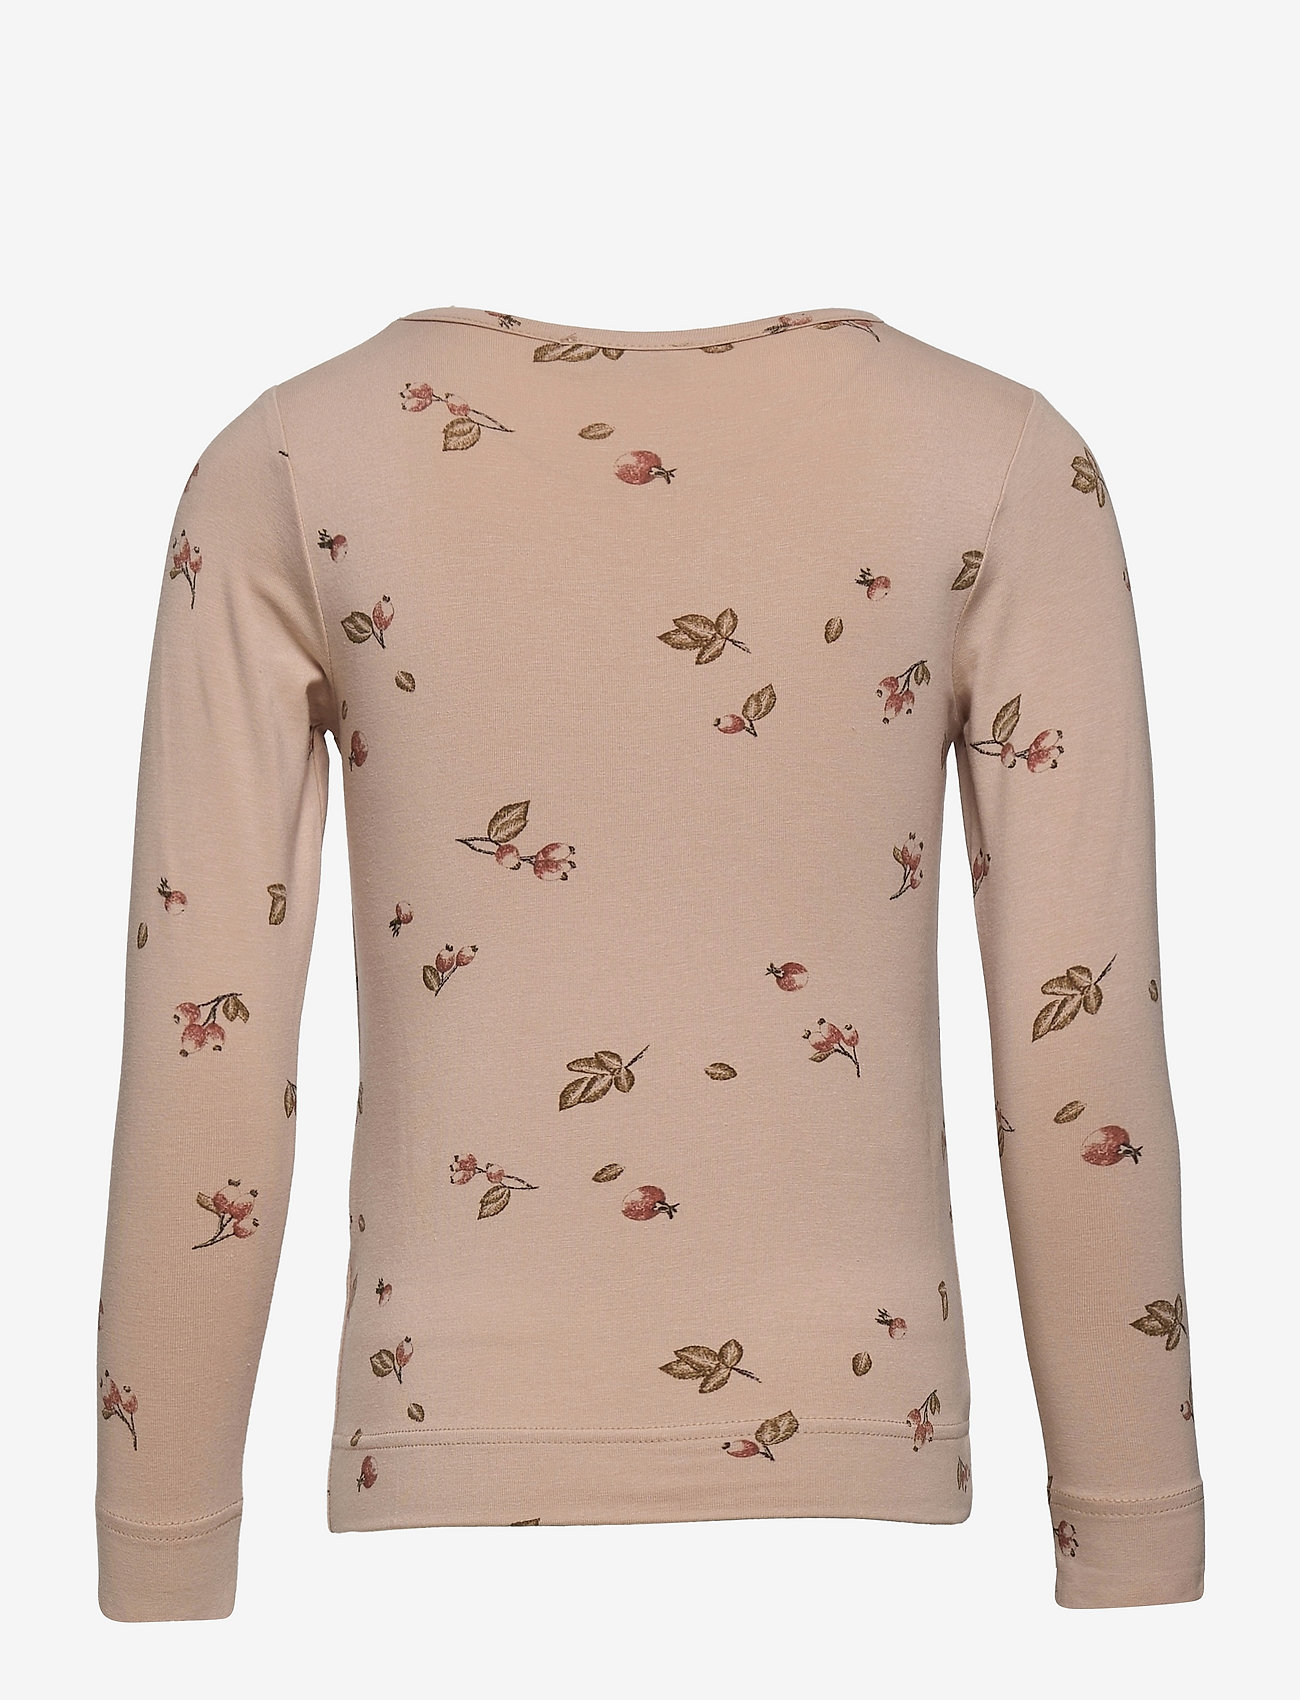 MarMar Cph - Teller - langærmede t-shirts - rosehips - 1